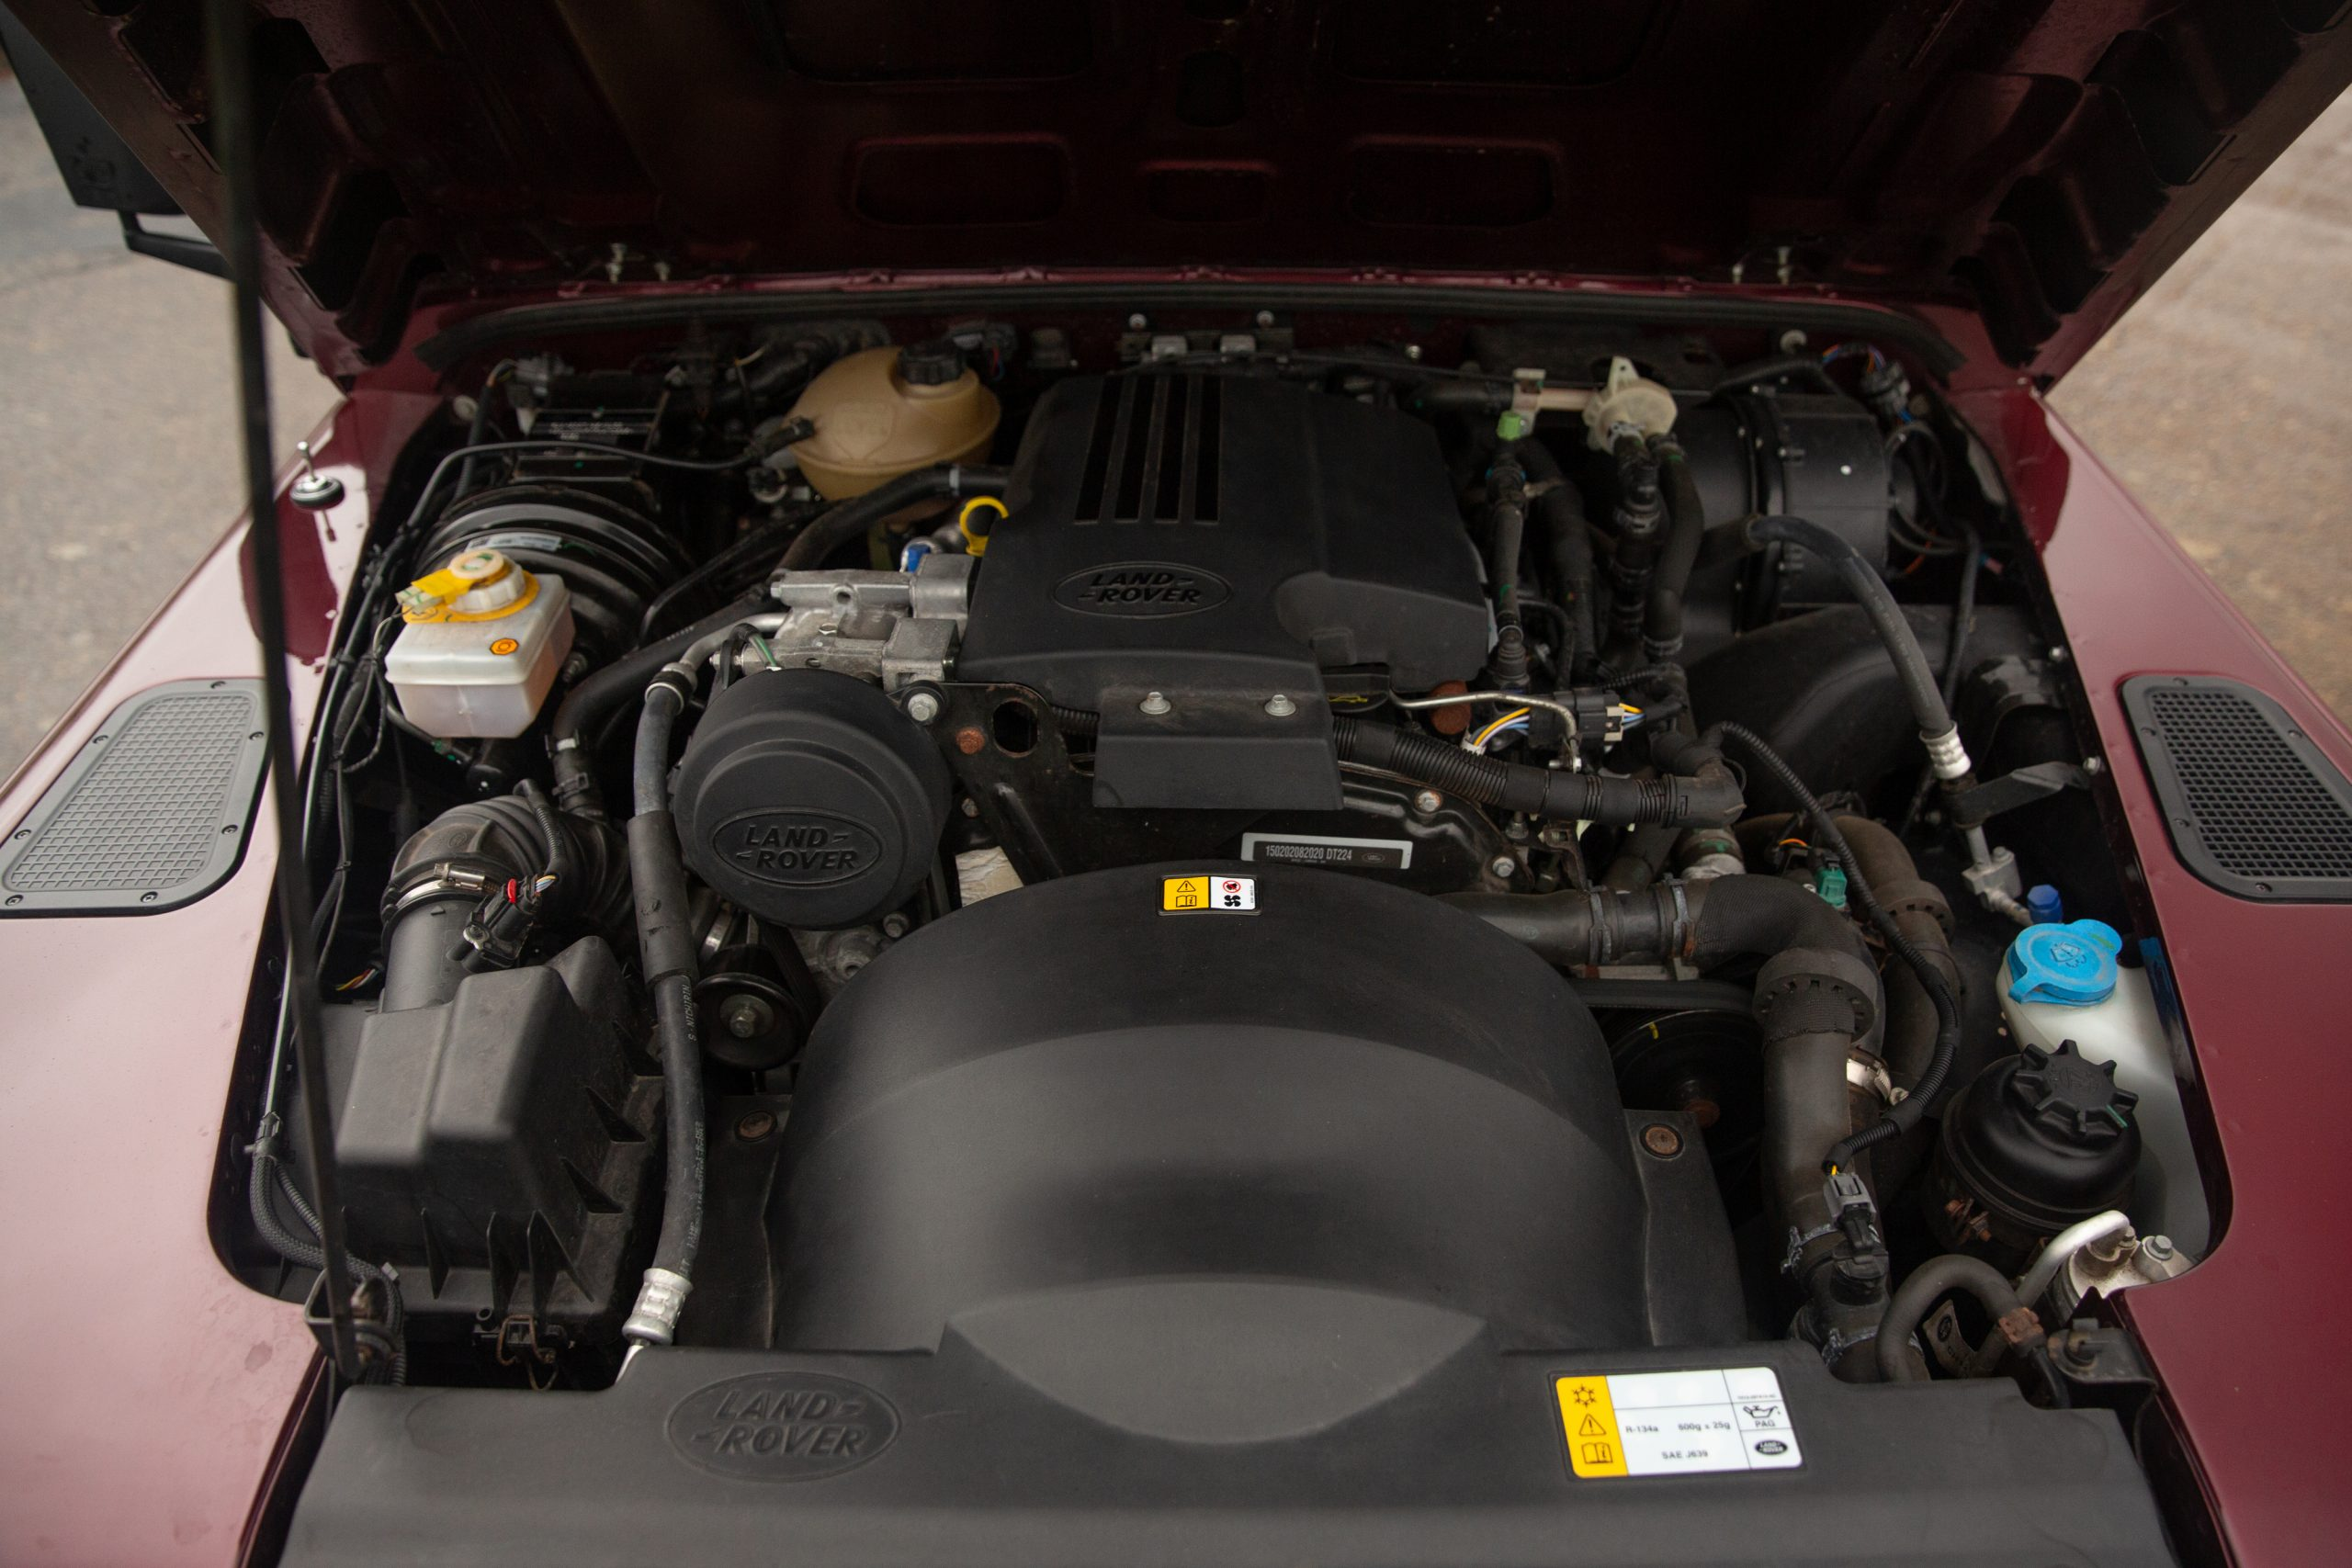 Land Rover Defender 110 Landmark XS engine